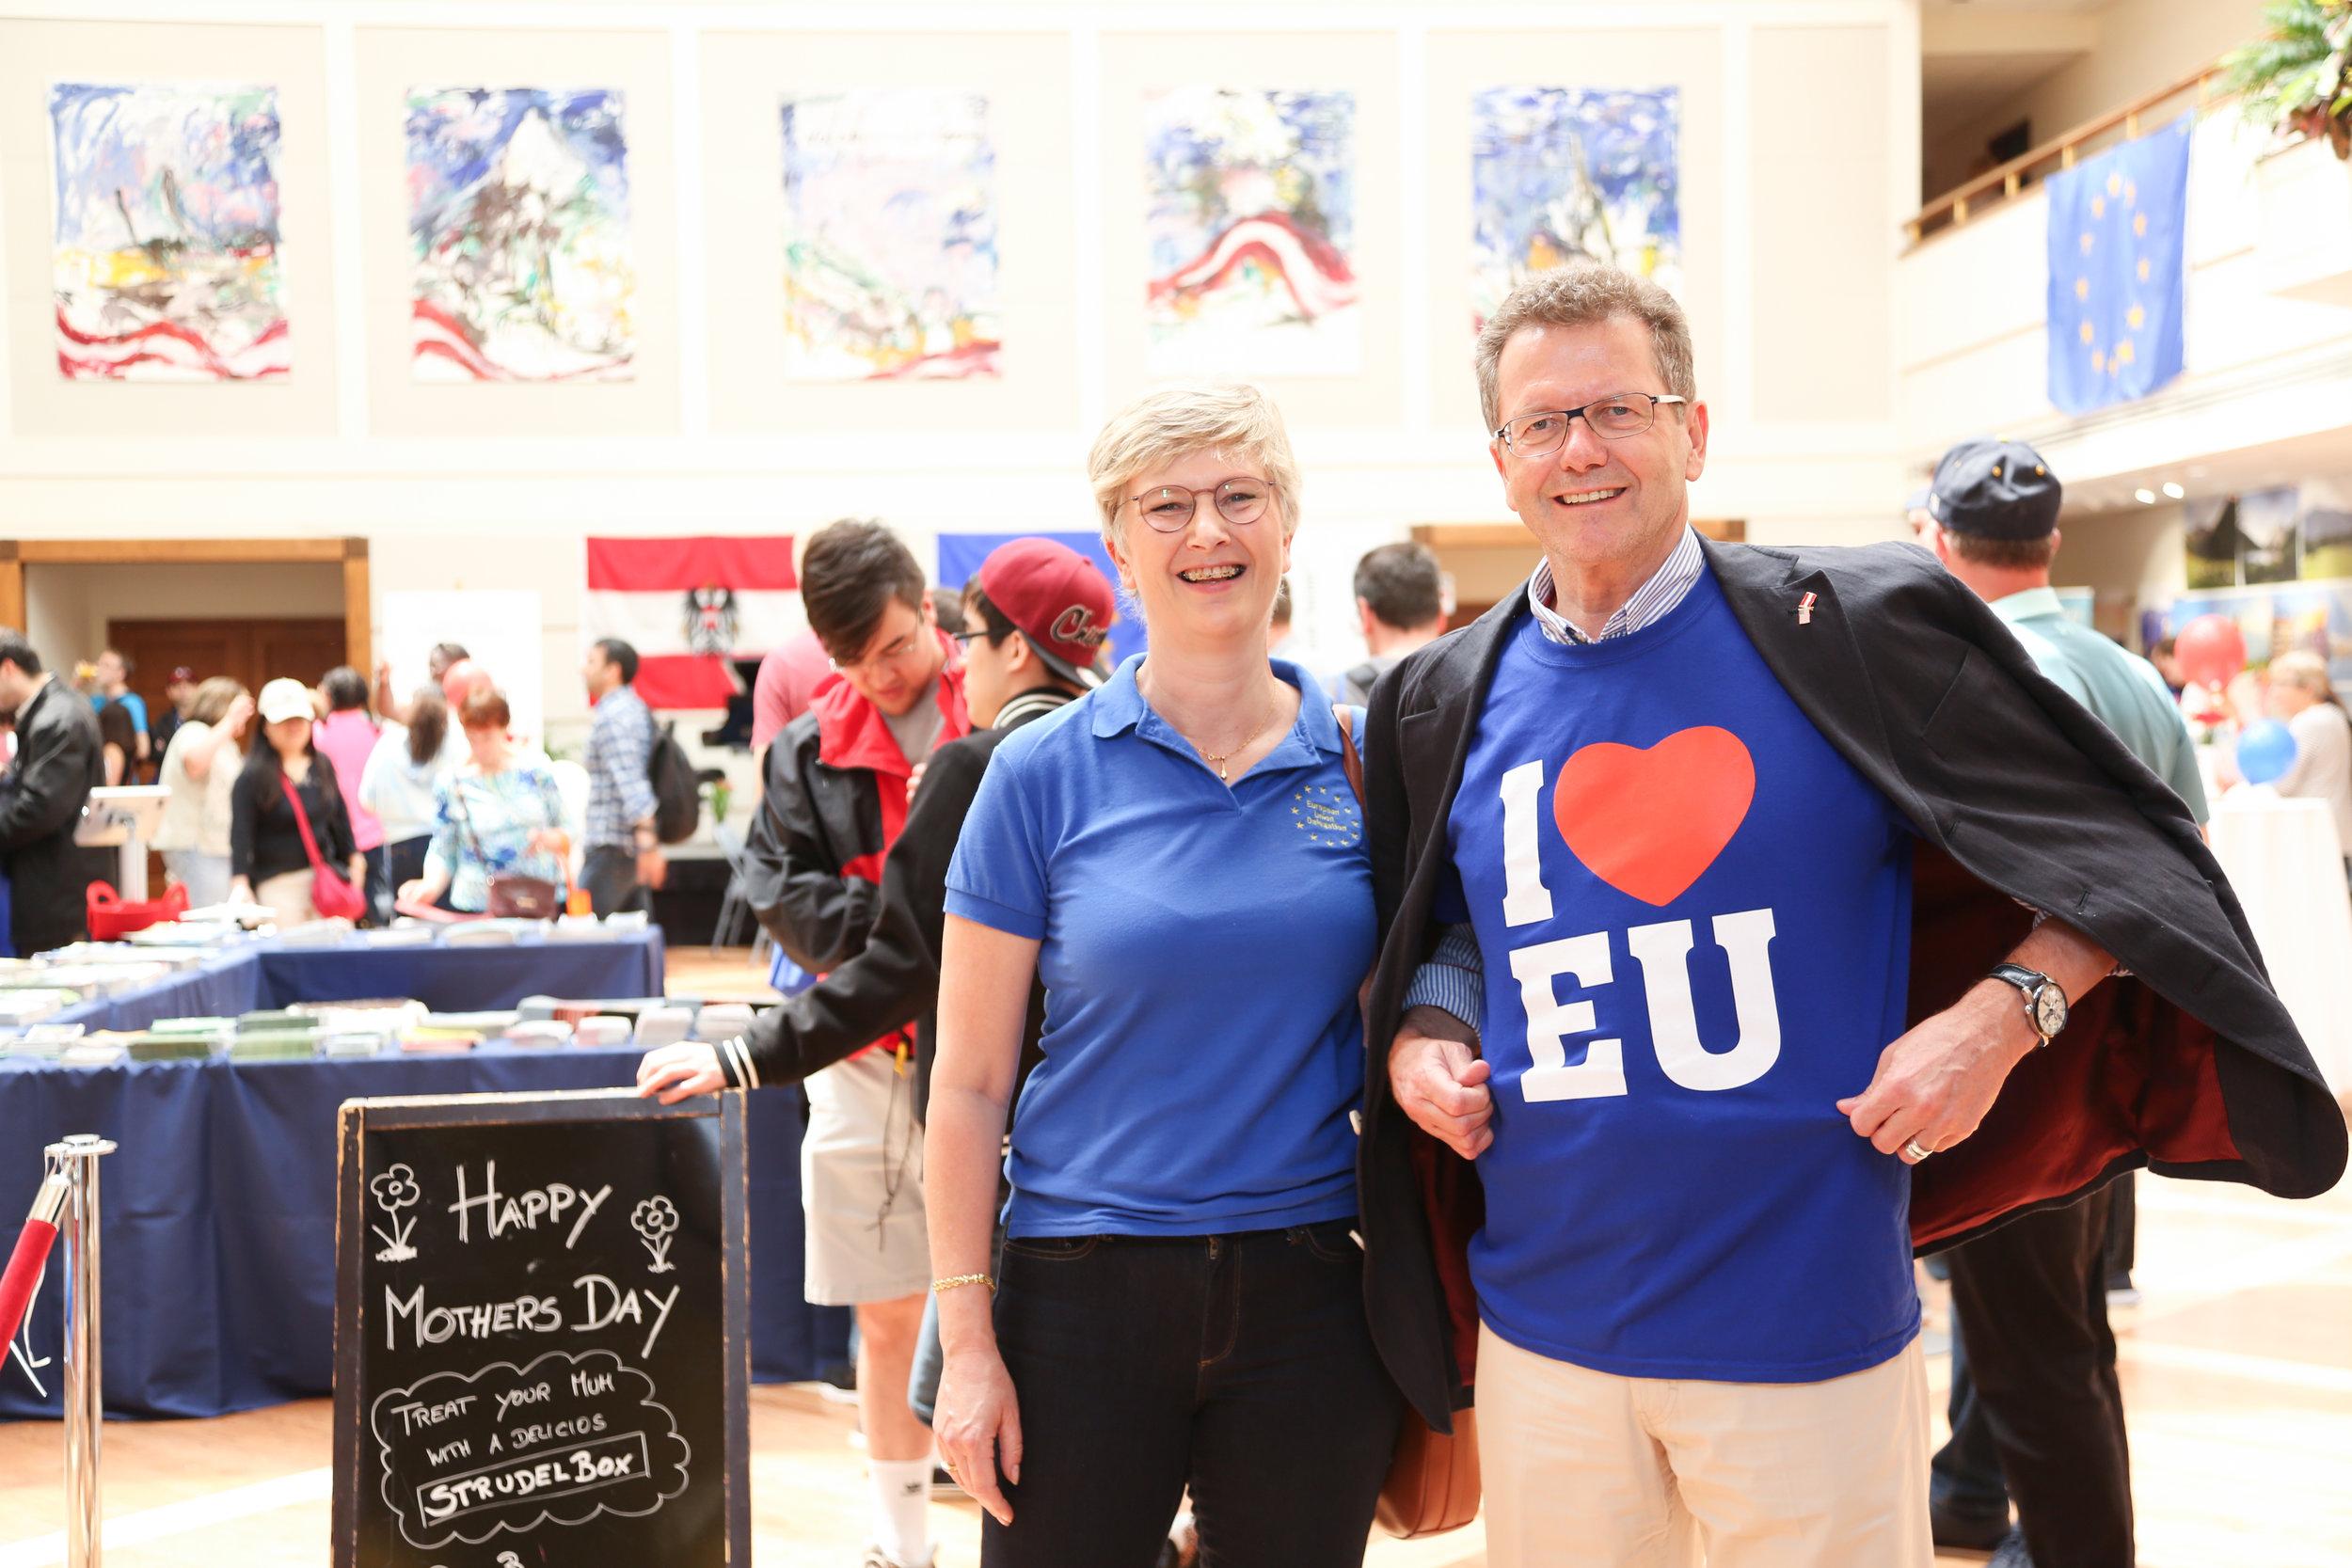 Austrian Ambassador Wolfgang Waldner with Caroline Vicini, Deputy Head of the EU Delegation in the USA